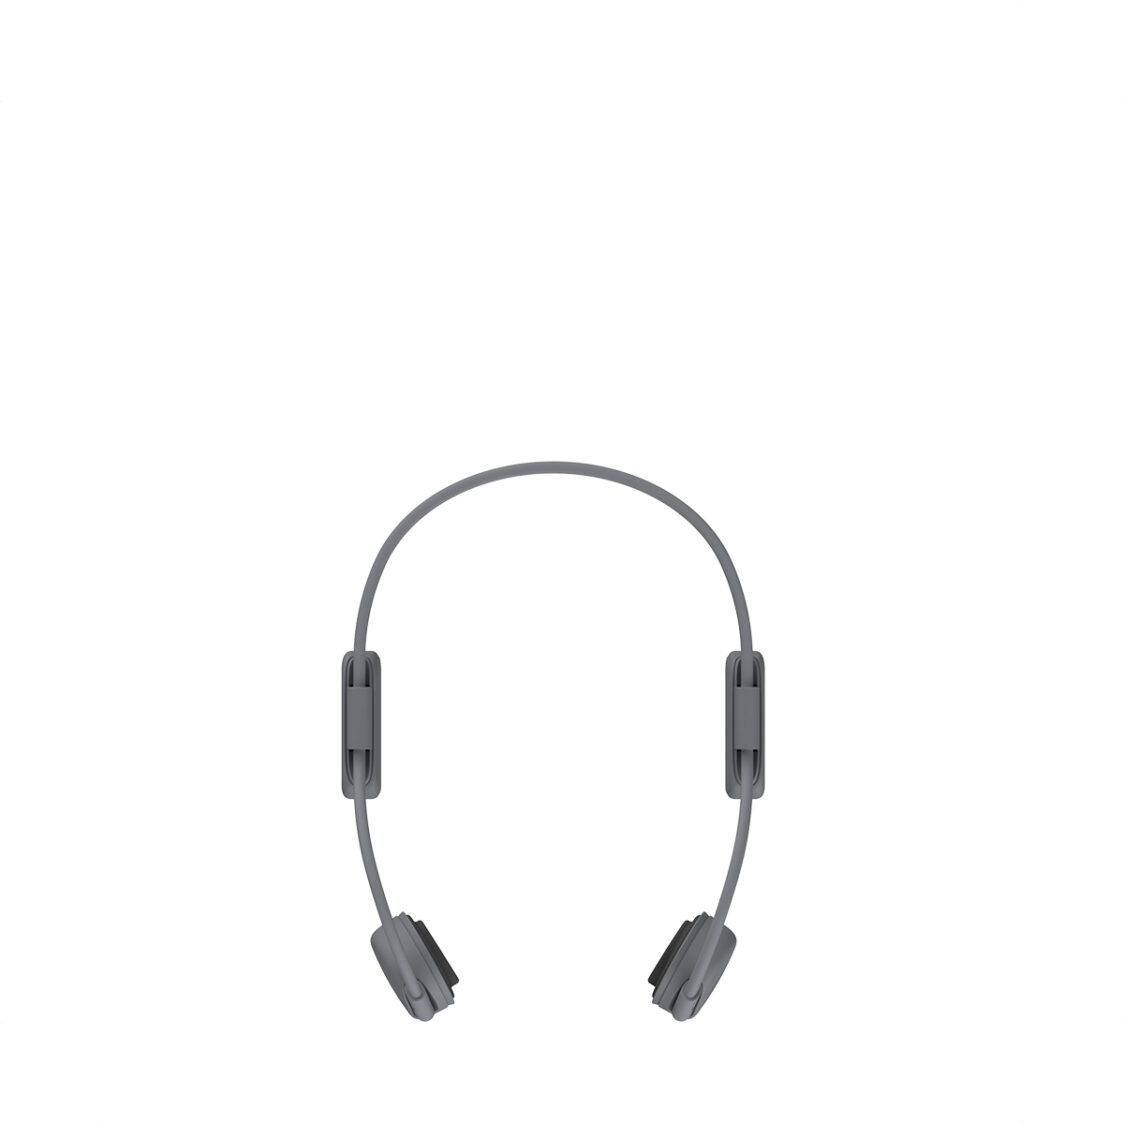 myFirst Headphone Wireless Bone Conduction Hearing Protection